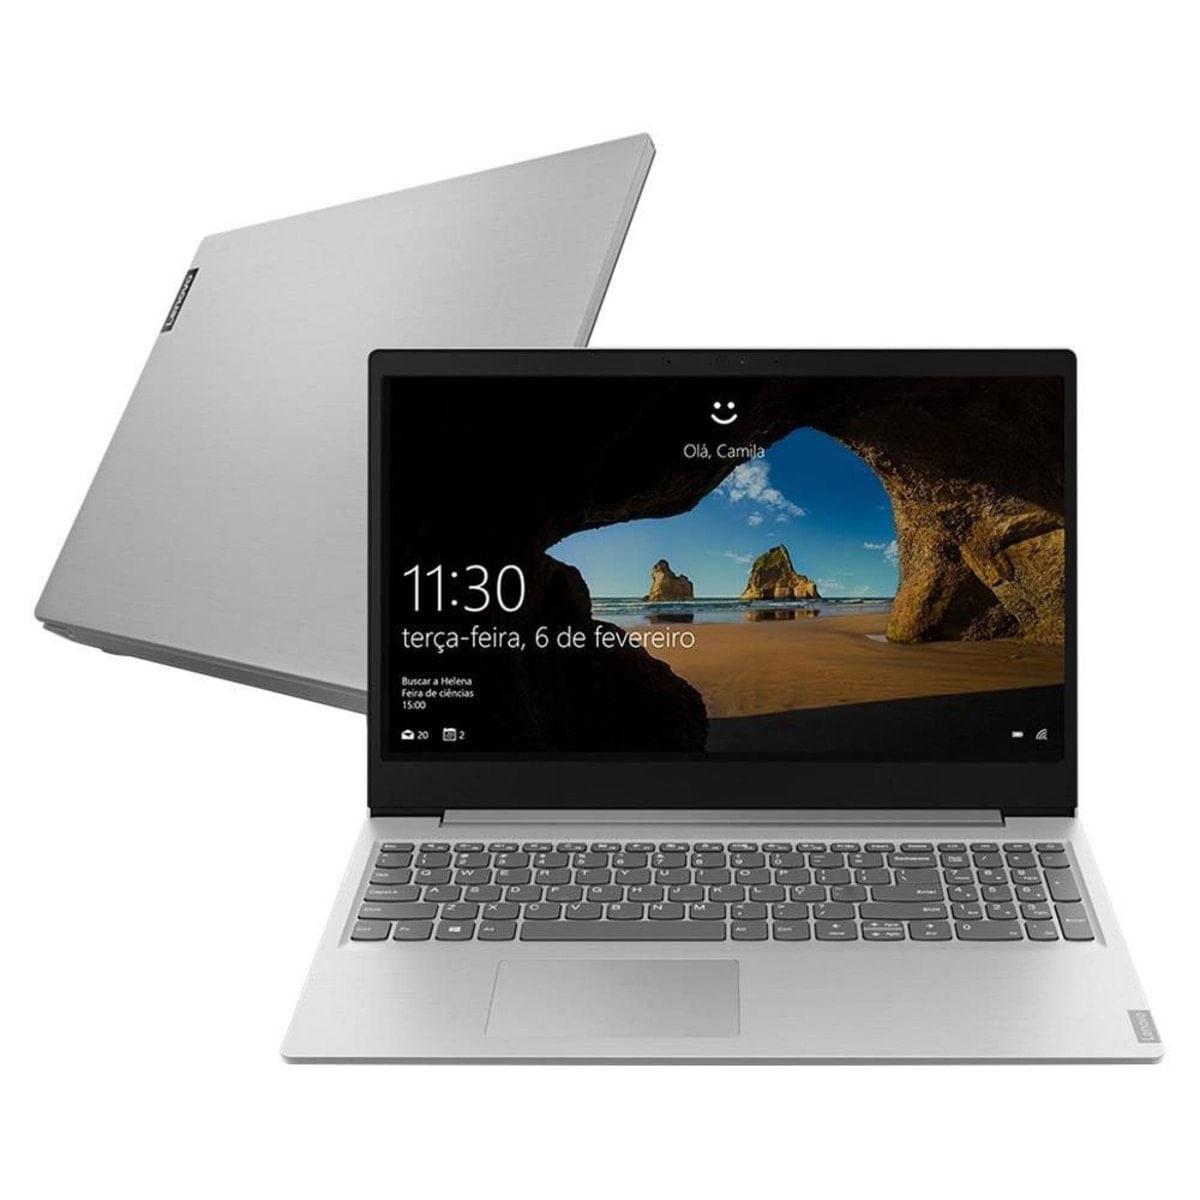 "Notebook - Lenovo 81s9000cbr Celeron N4000 1.10ghz 4gb 500gb Padrão Intel Hd Graphics 600 Windows 10 Professional Ideapad S145 15,6"" Polegadas"